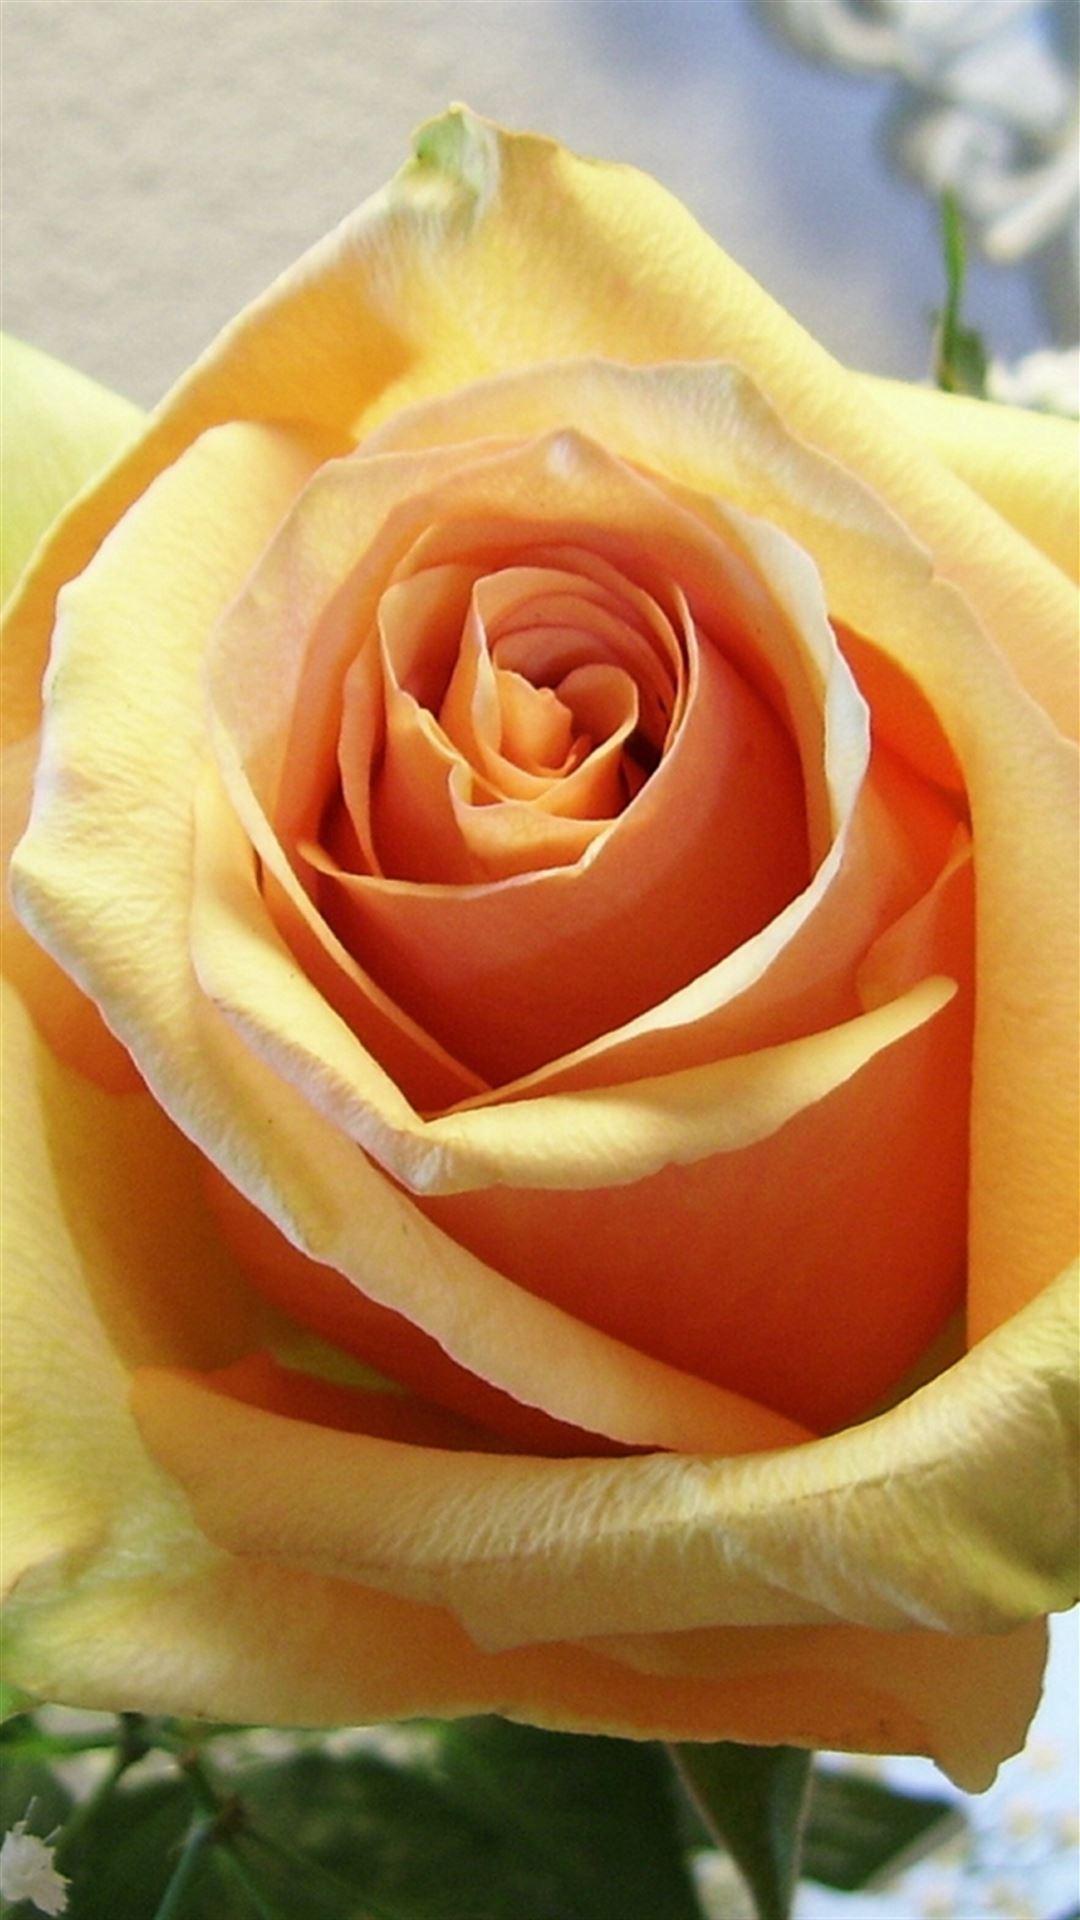 Rose Flower Tender Bud Close Up iPhone se wallpaper